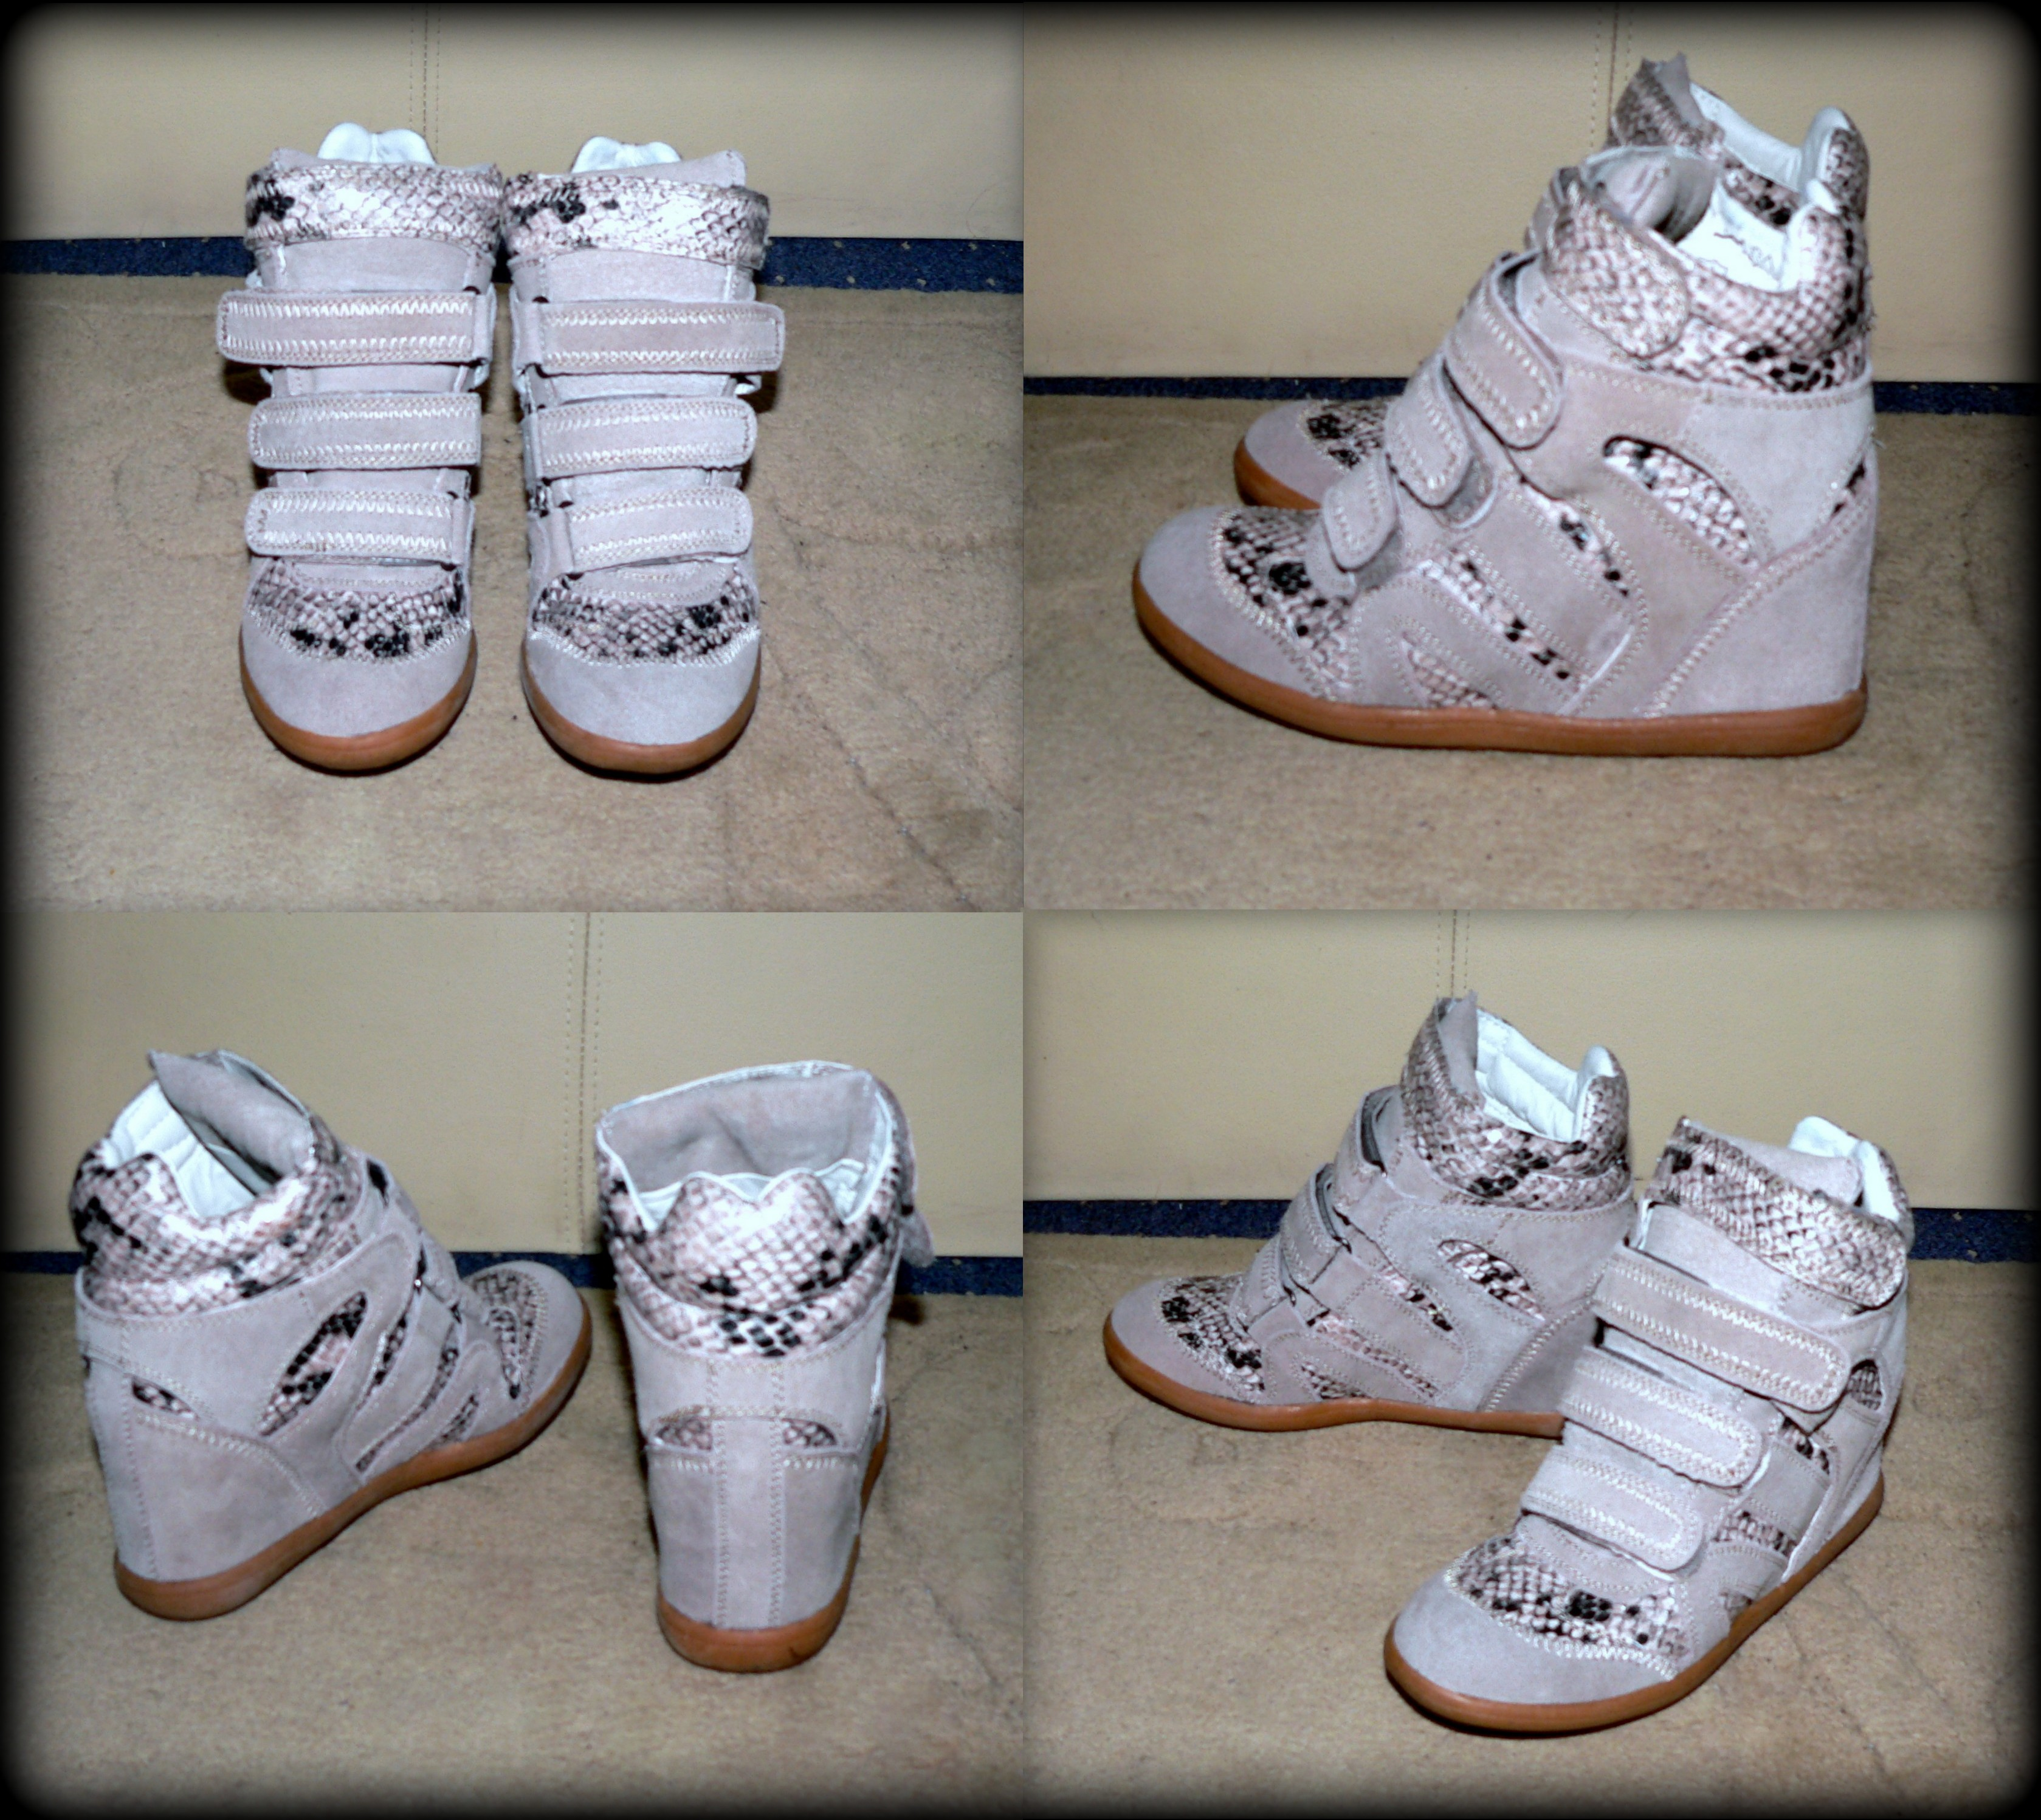 High hell sneaker - Magas talpú sportcipő - My daily-life 8289b5bfcc